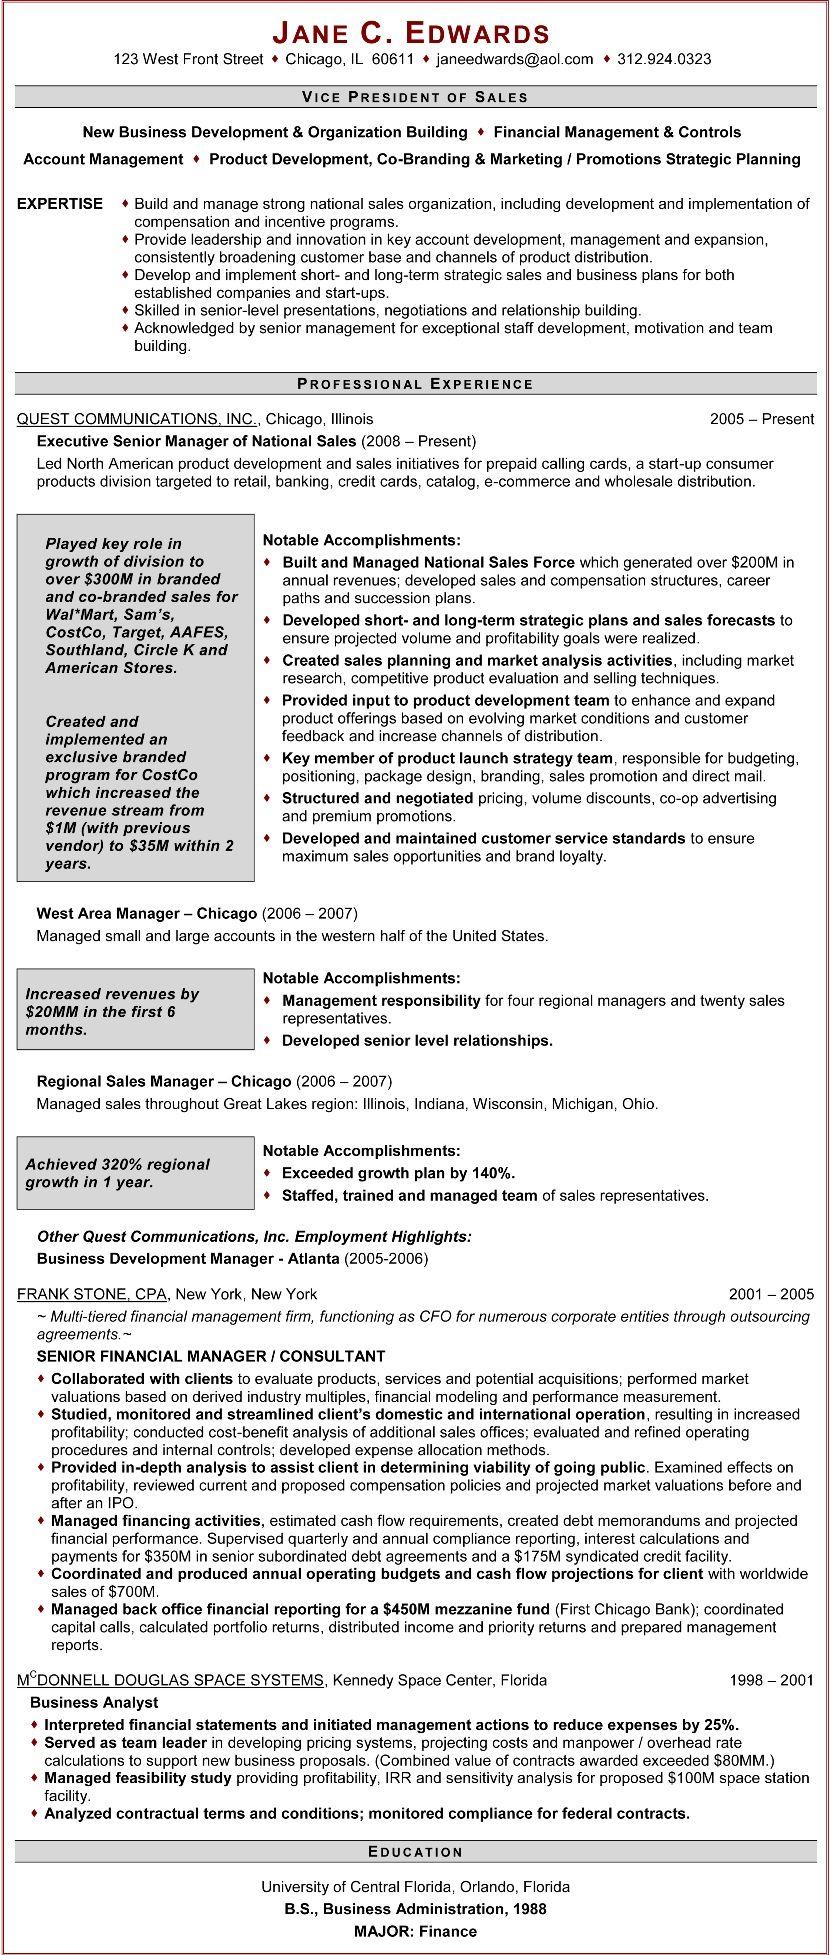 Executive resume samples professional resume writers